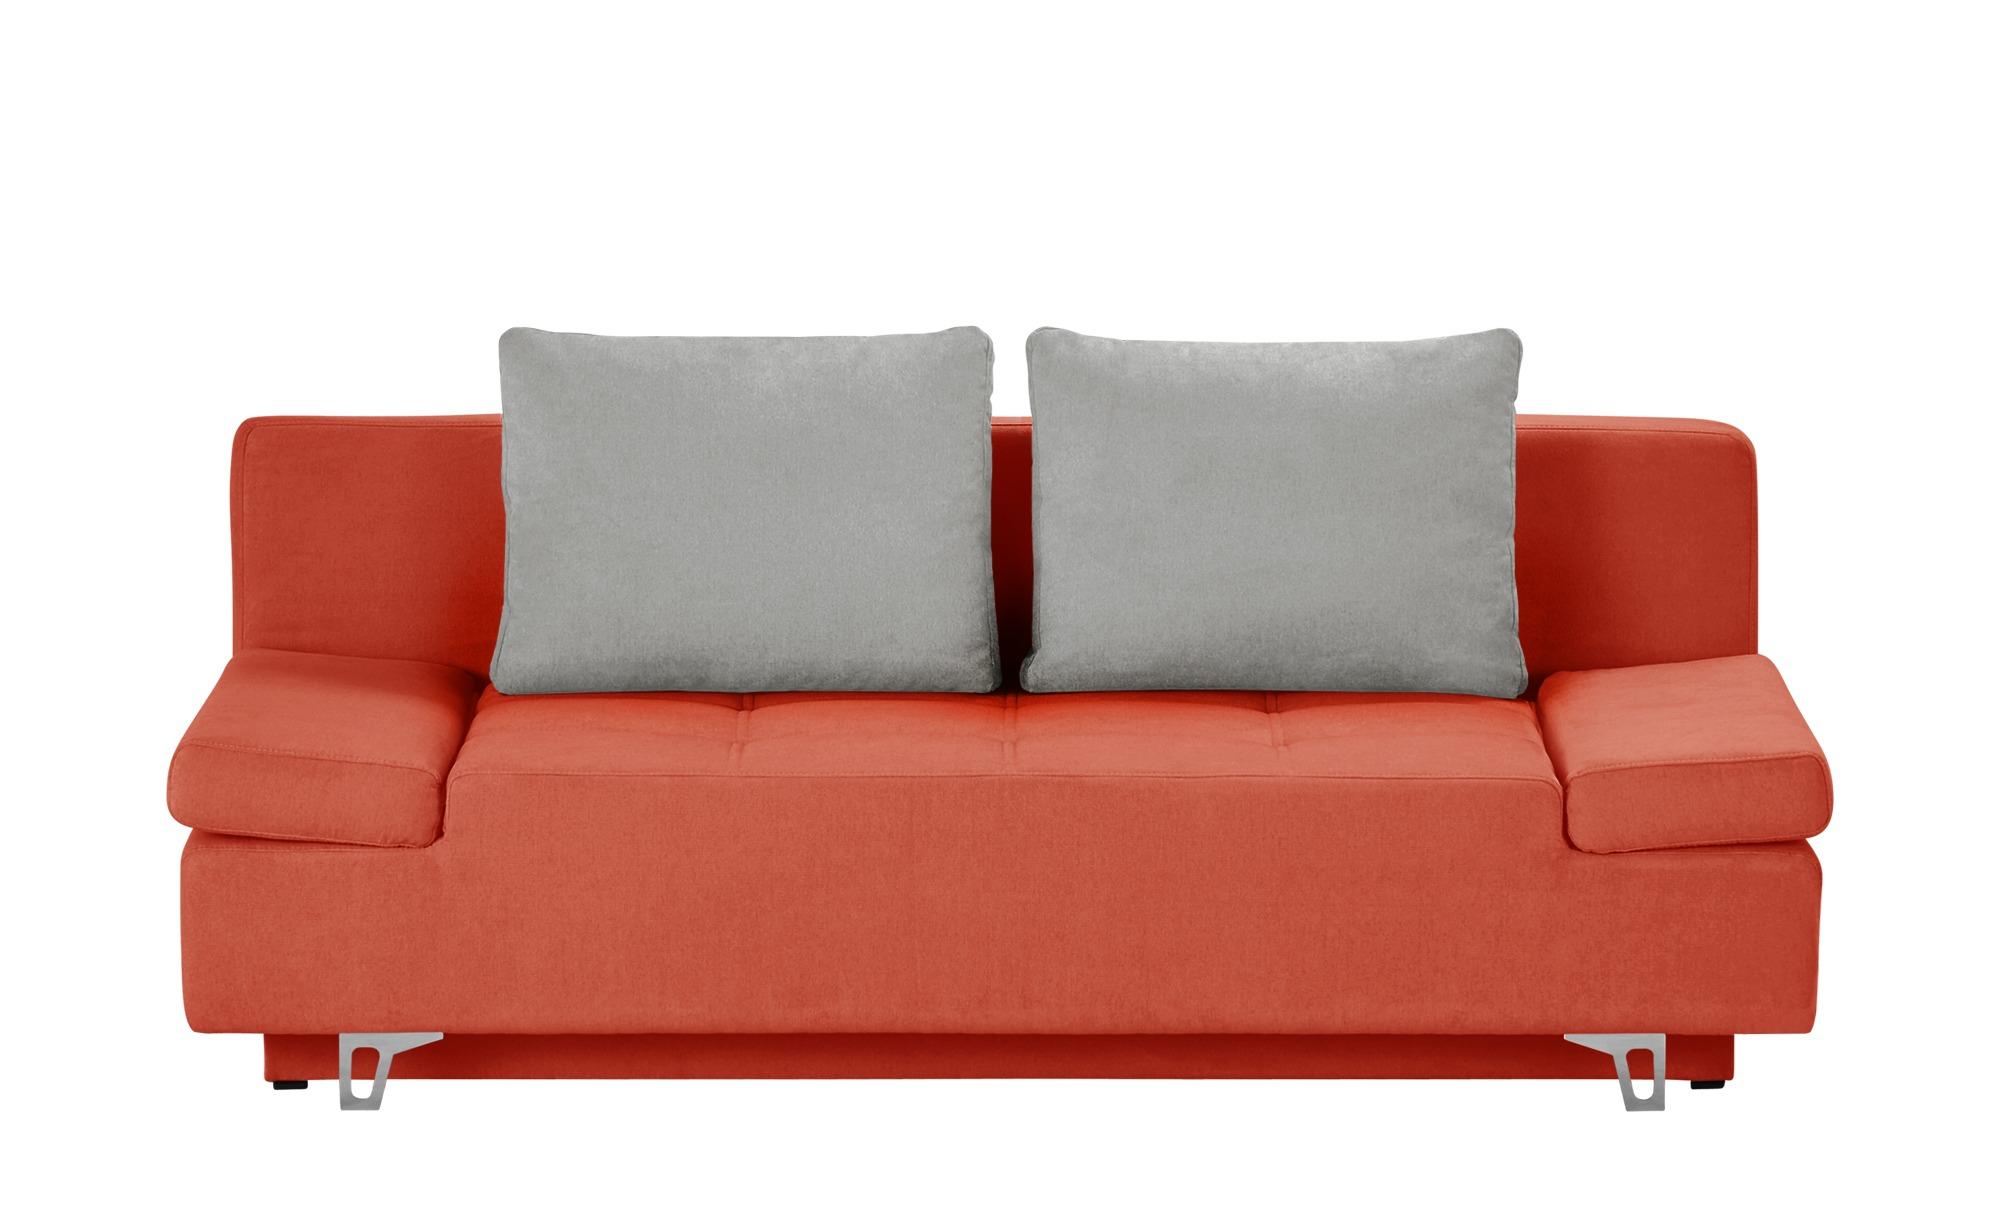 Smart schlafsofa patriece breite 200 cm h he 90 cm for Schlafsofa orange